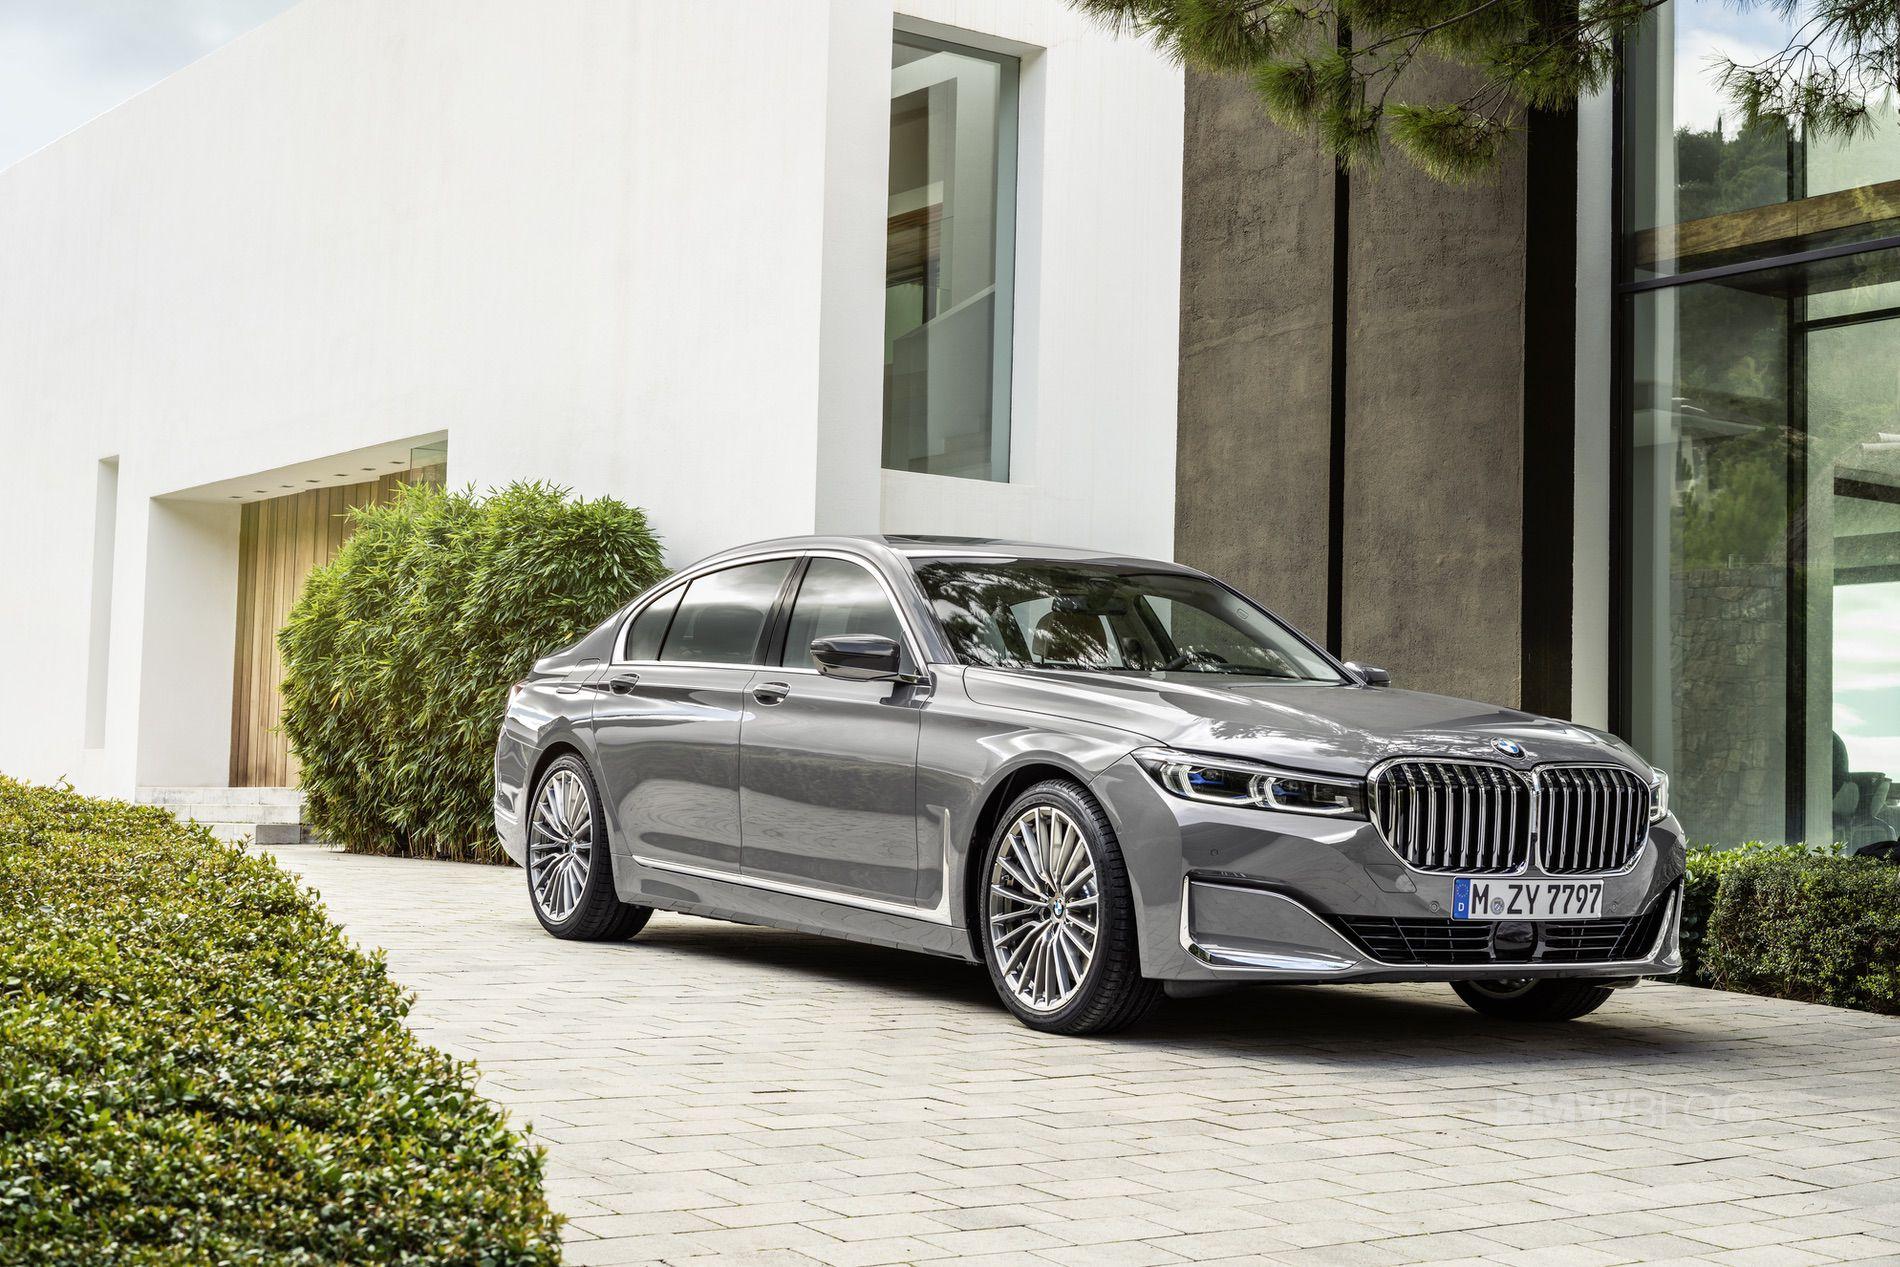 2019 BMW 7 Series Facelift exterior 19